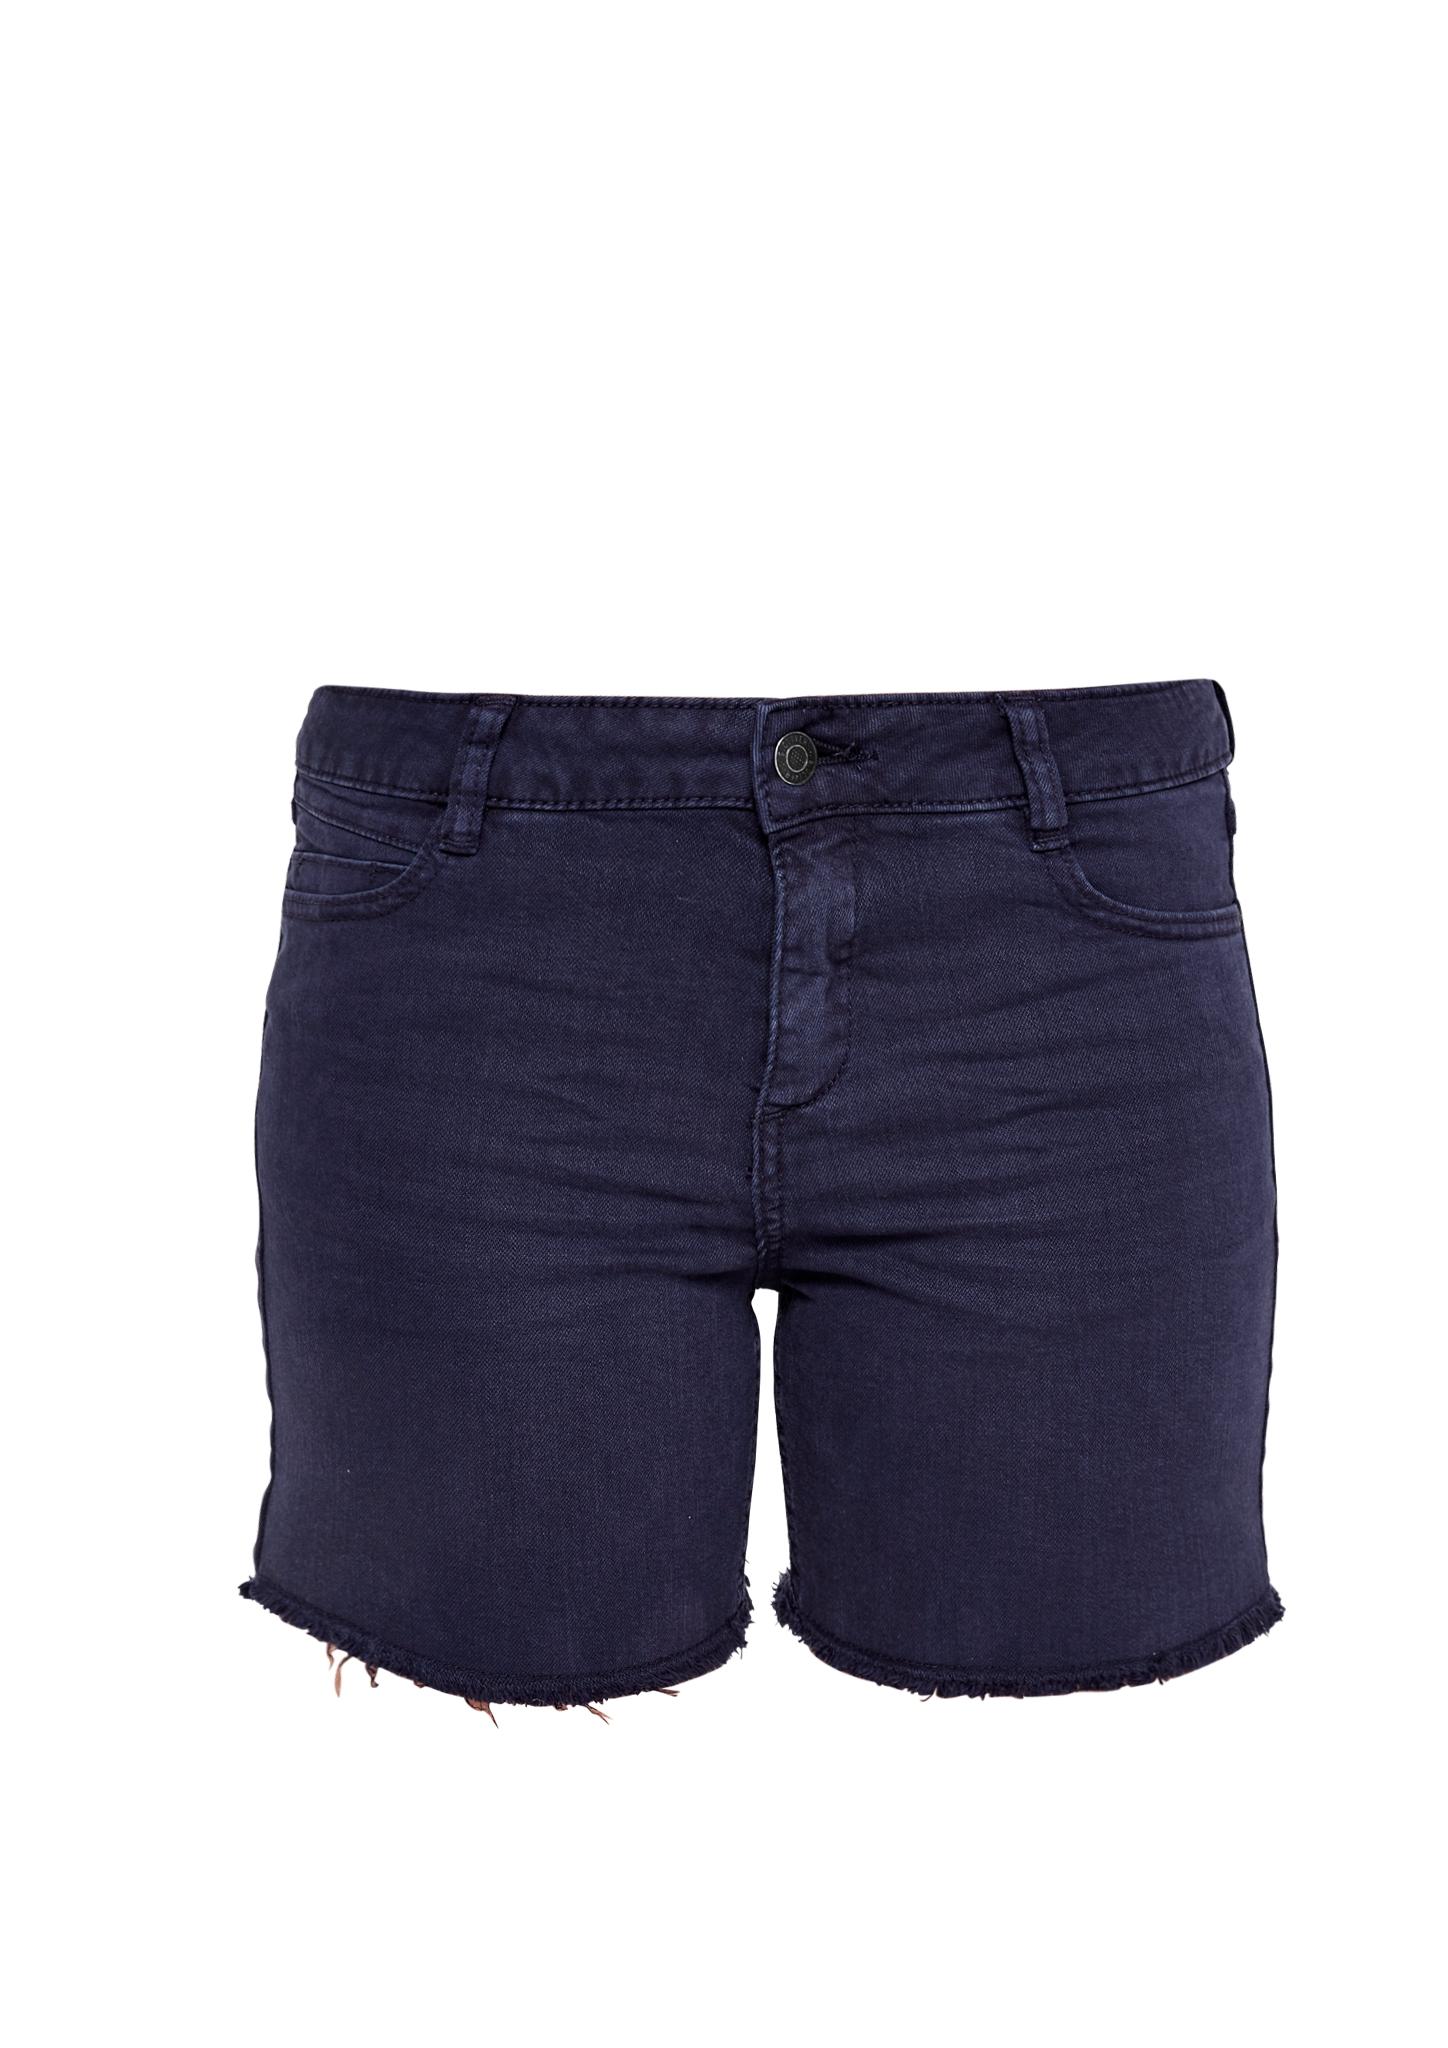 Shorts | Bekleidung > Hosen > Shorts & Bermudas | Blau | Obermaterial: 80% baumwolle -  18% viskose -  2% elasthan| futter: 100% baumwolle | s.Oliver